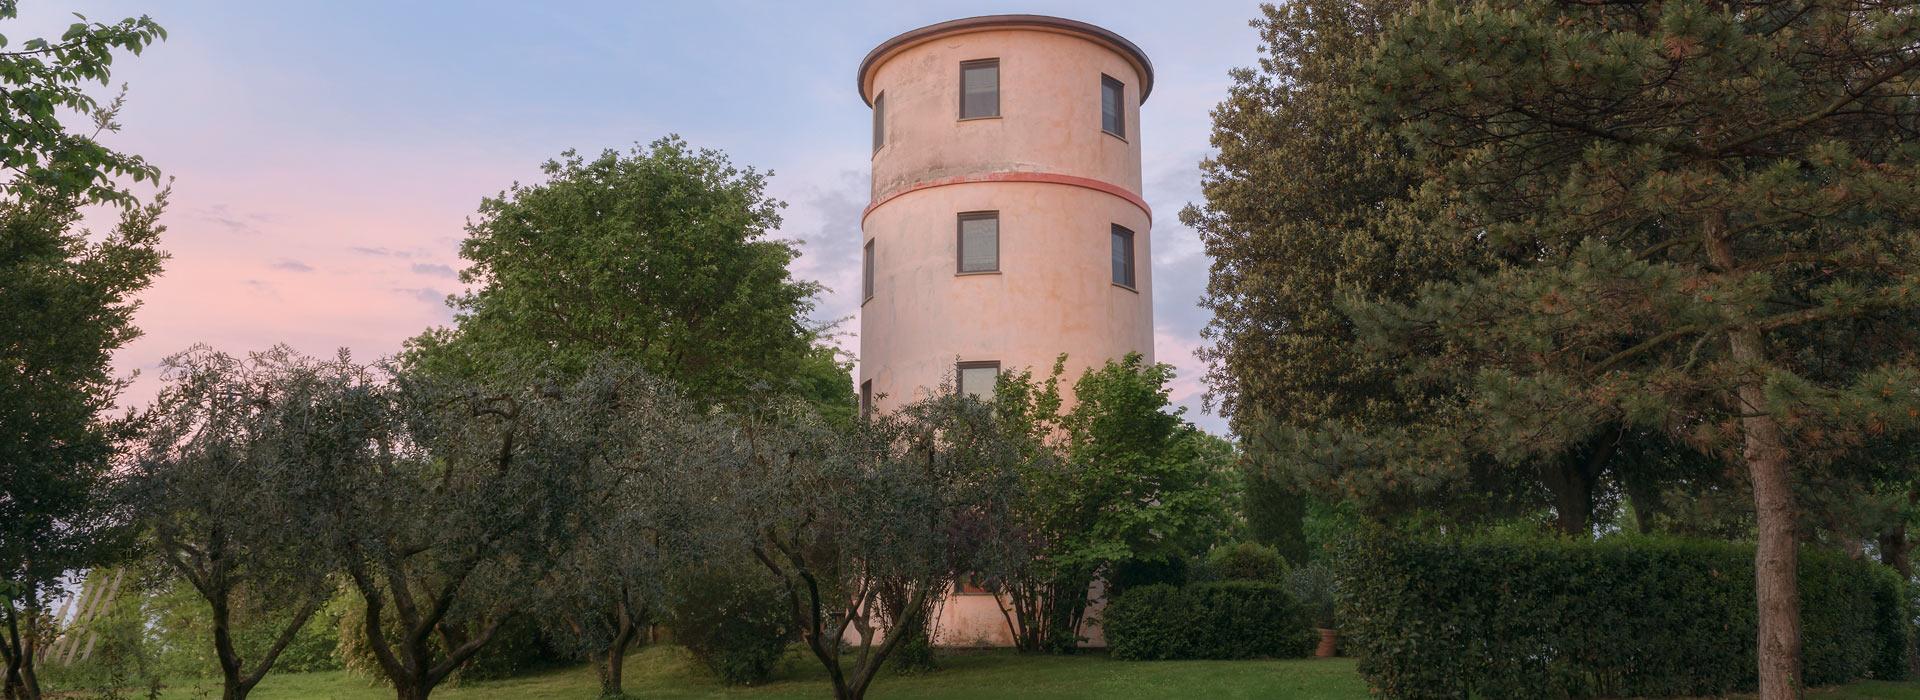 Torre Agriturismo Nelle Marche